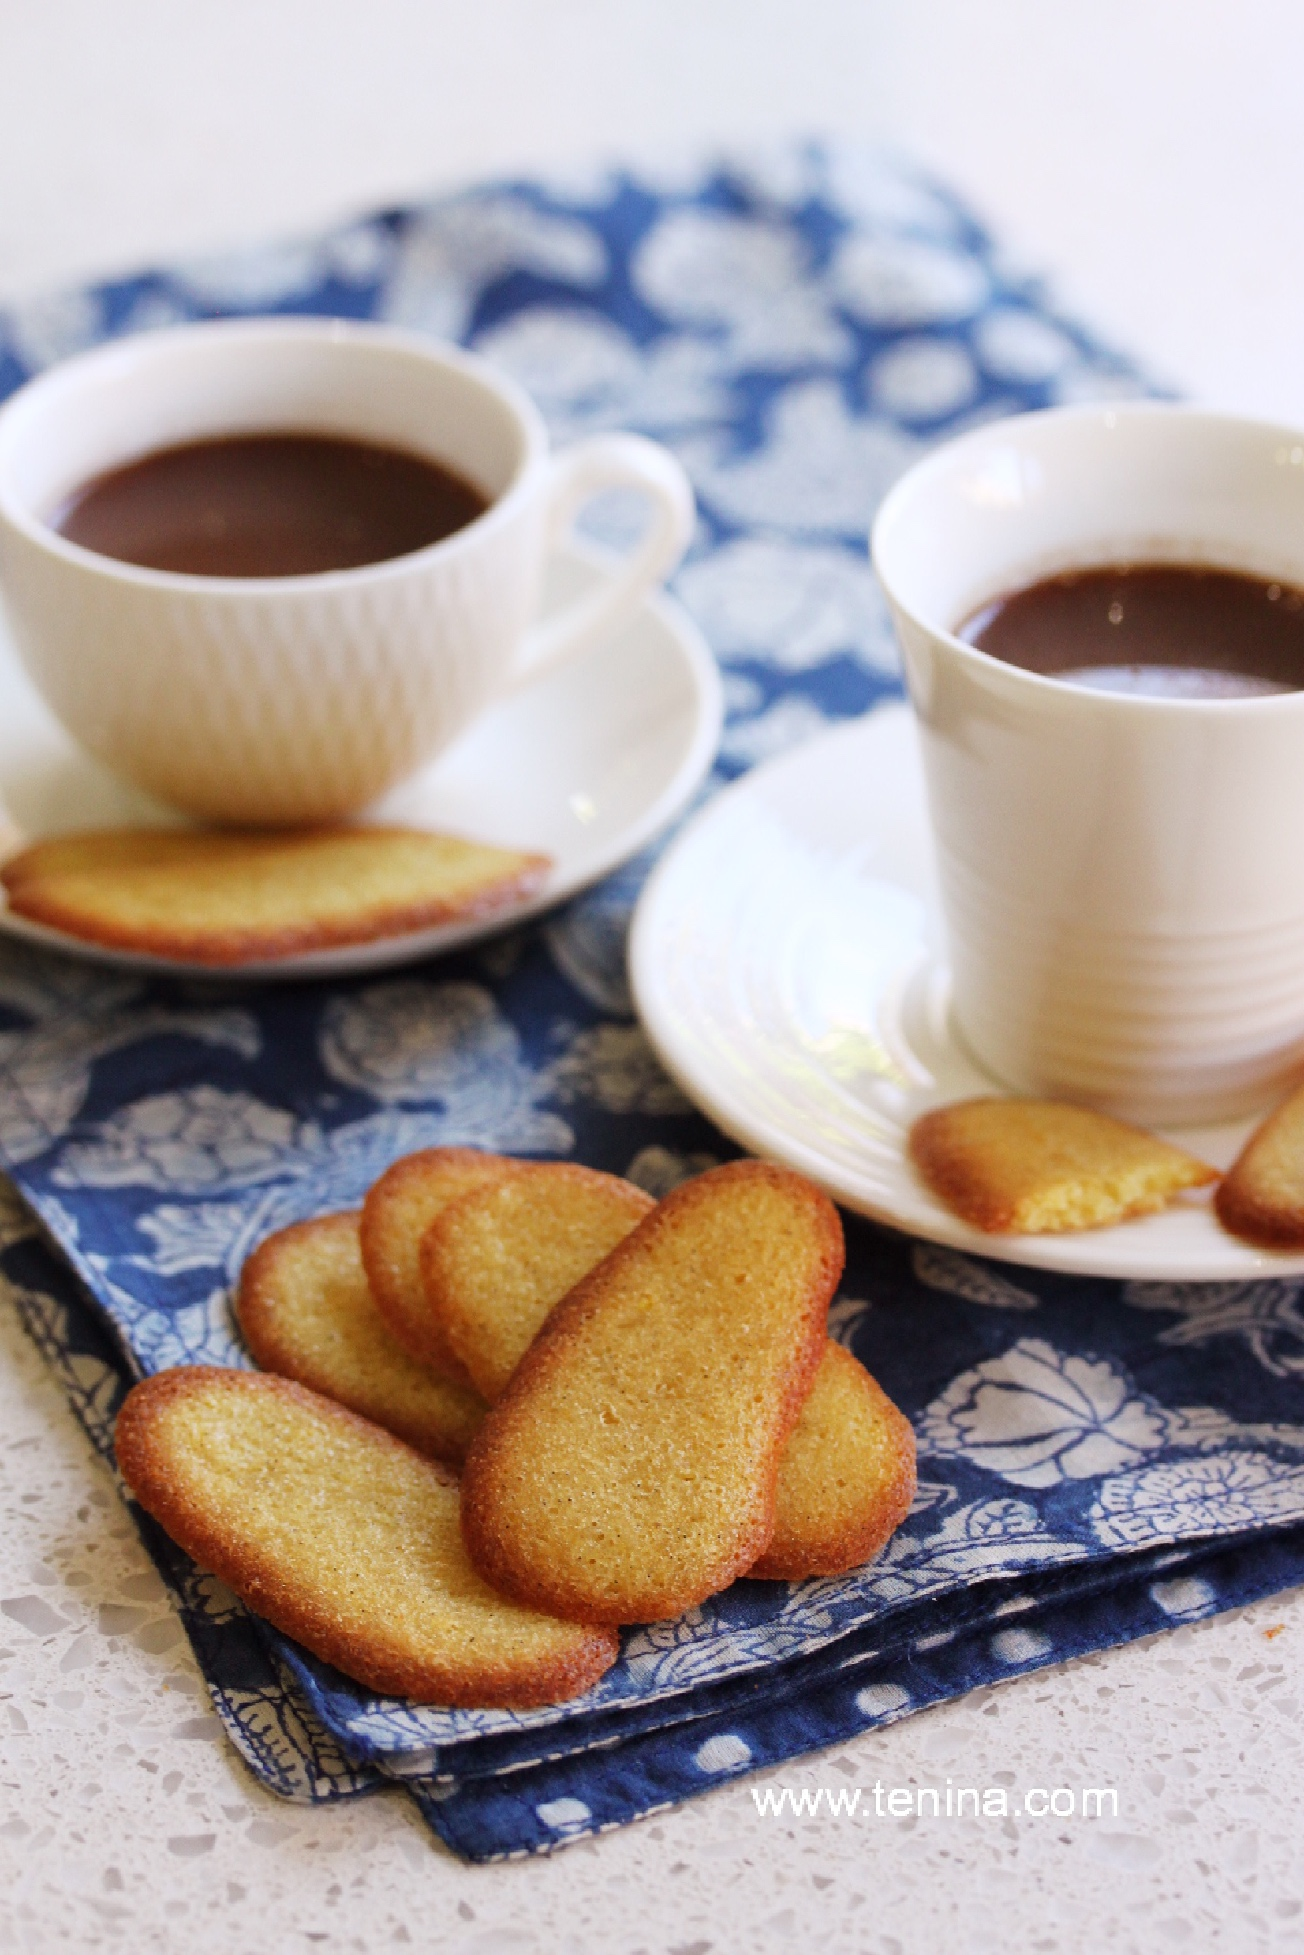 thermomix recipe langues de chat dessert biscuits. Black Bedroom Furniture Sets. Home Design Ideas